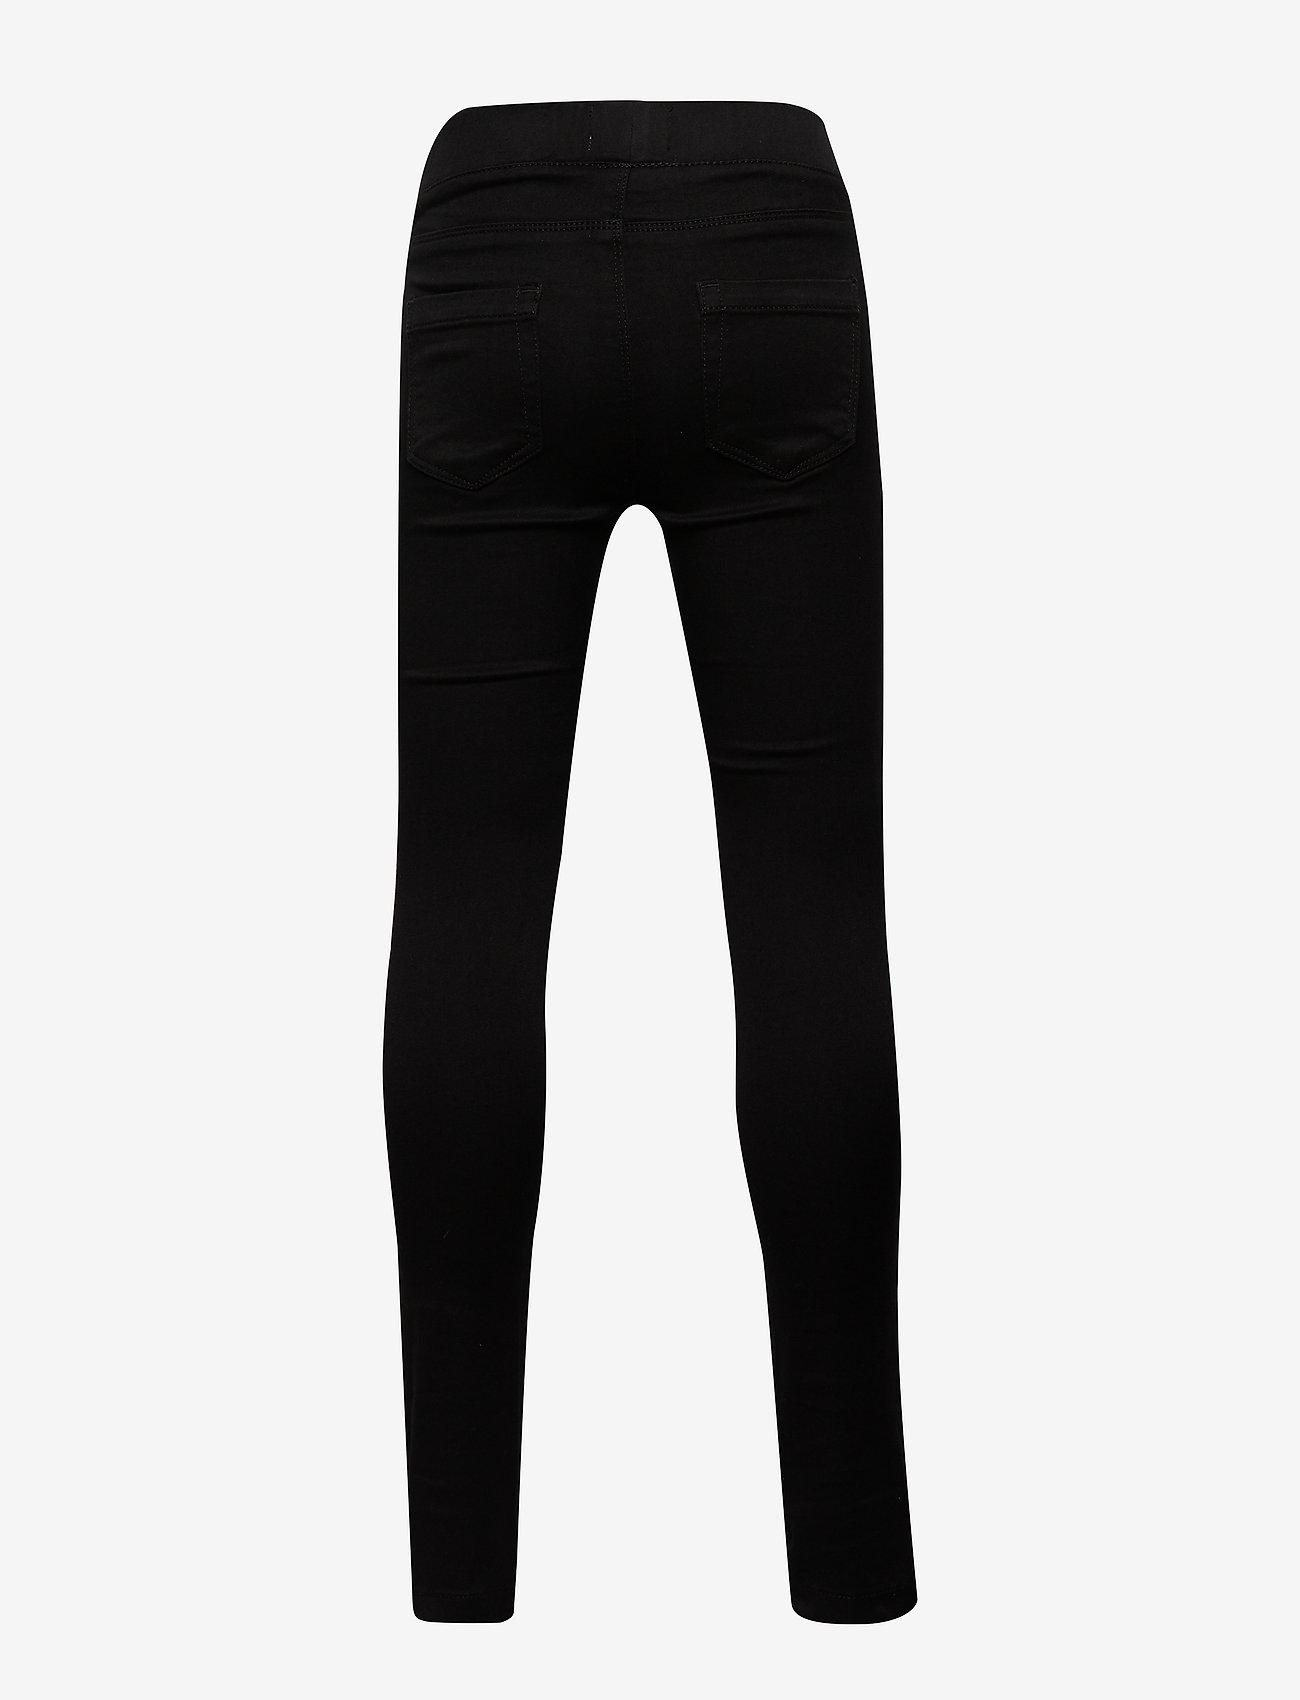 Kids Only - KONJUNE ROYAL DNM JEGGINGS 600 NOOS - leggings - black denim - 1